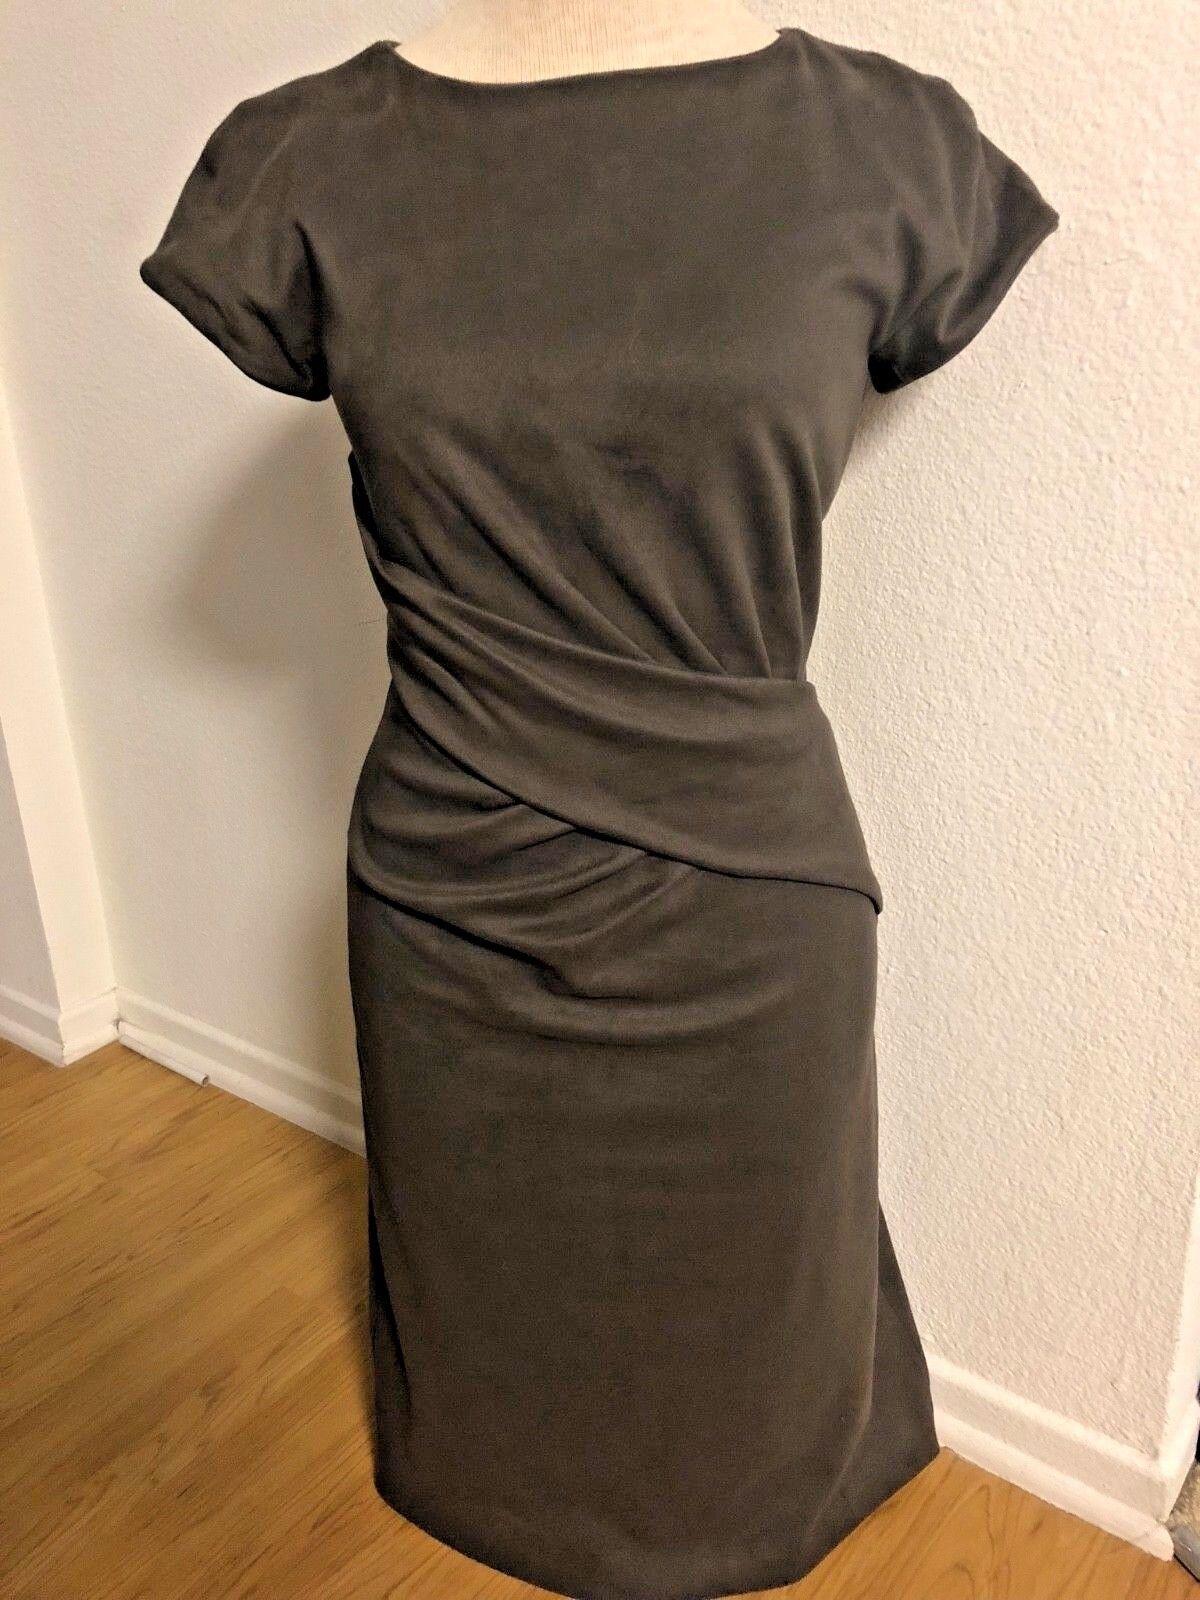 1200 Authentic Giorgio Armani Suede Sheath Dress Brown XSMALL IT 38 US 0